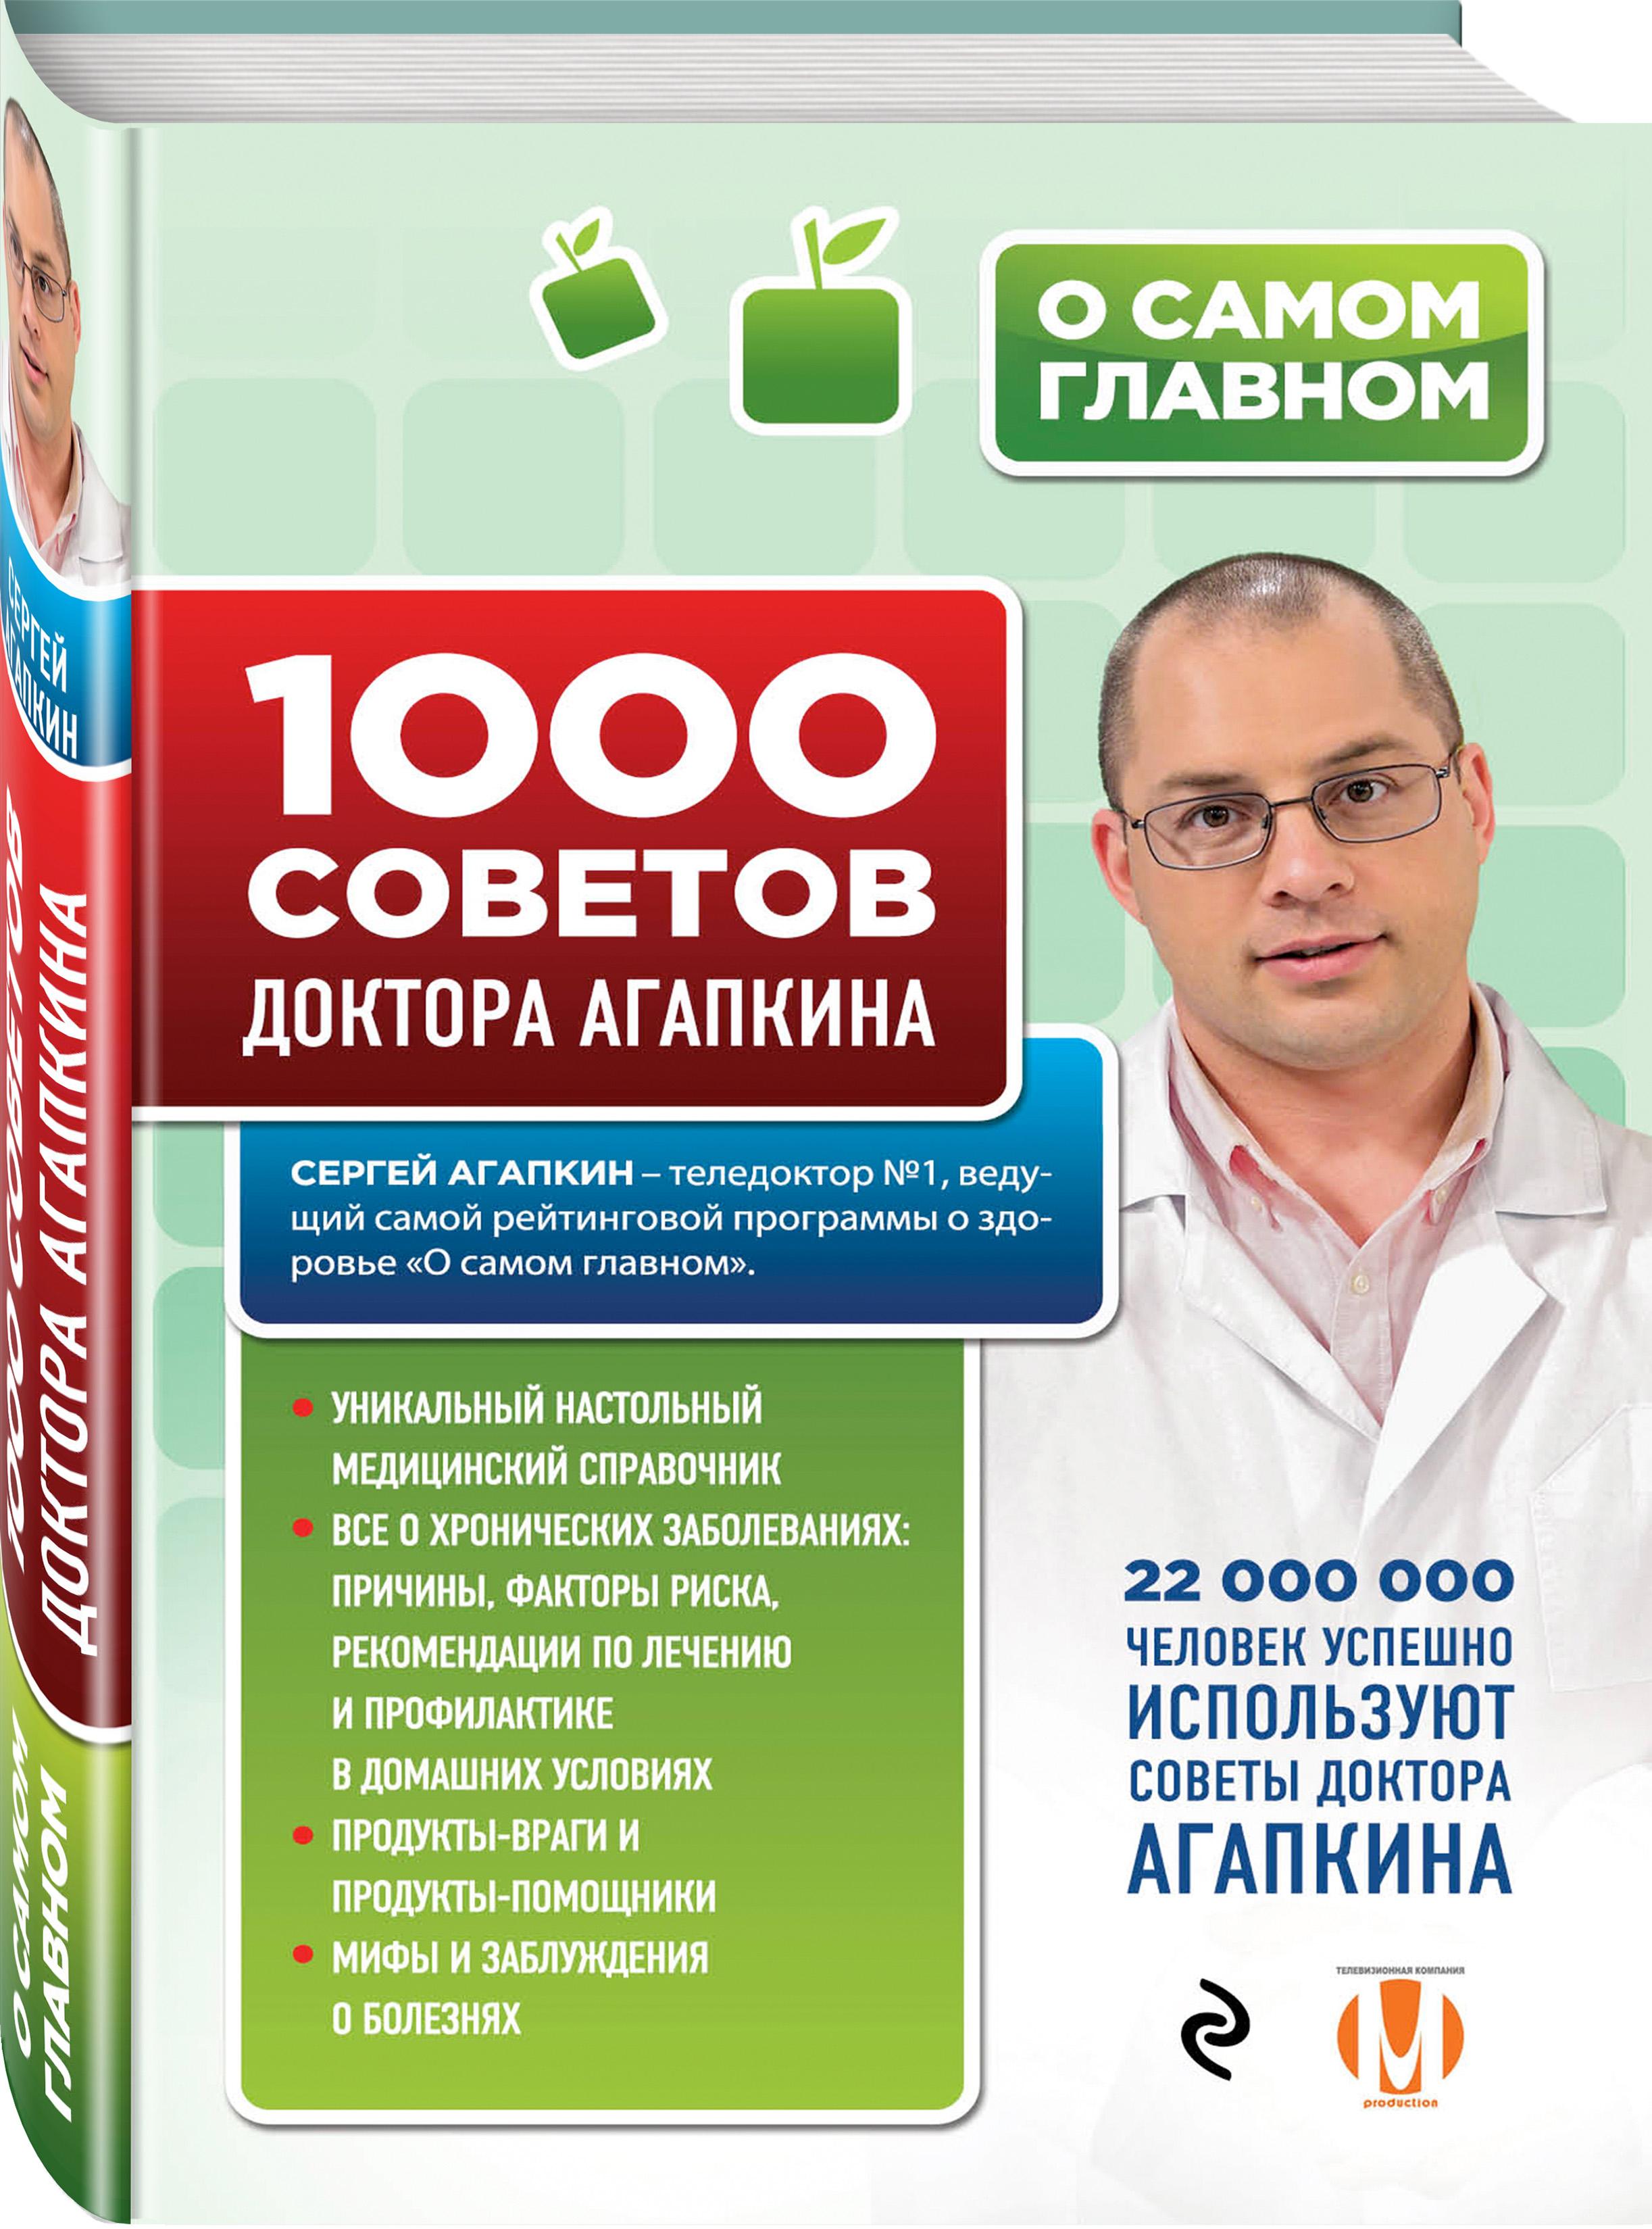 Агапкин С.Н. 1000 советов доктора Агапкина